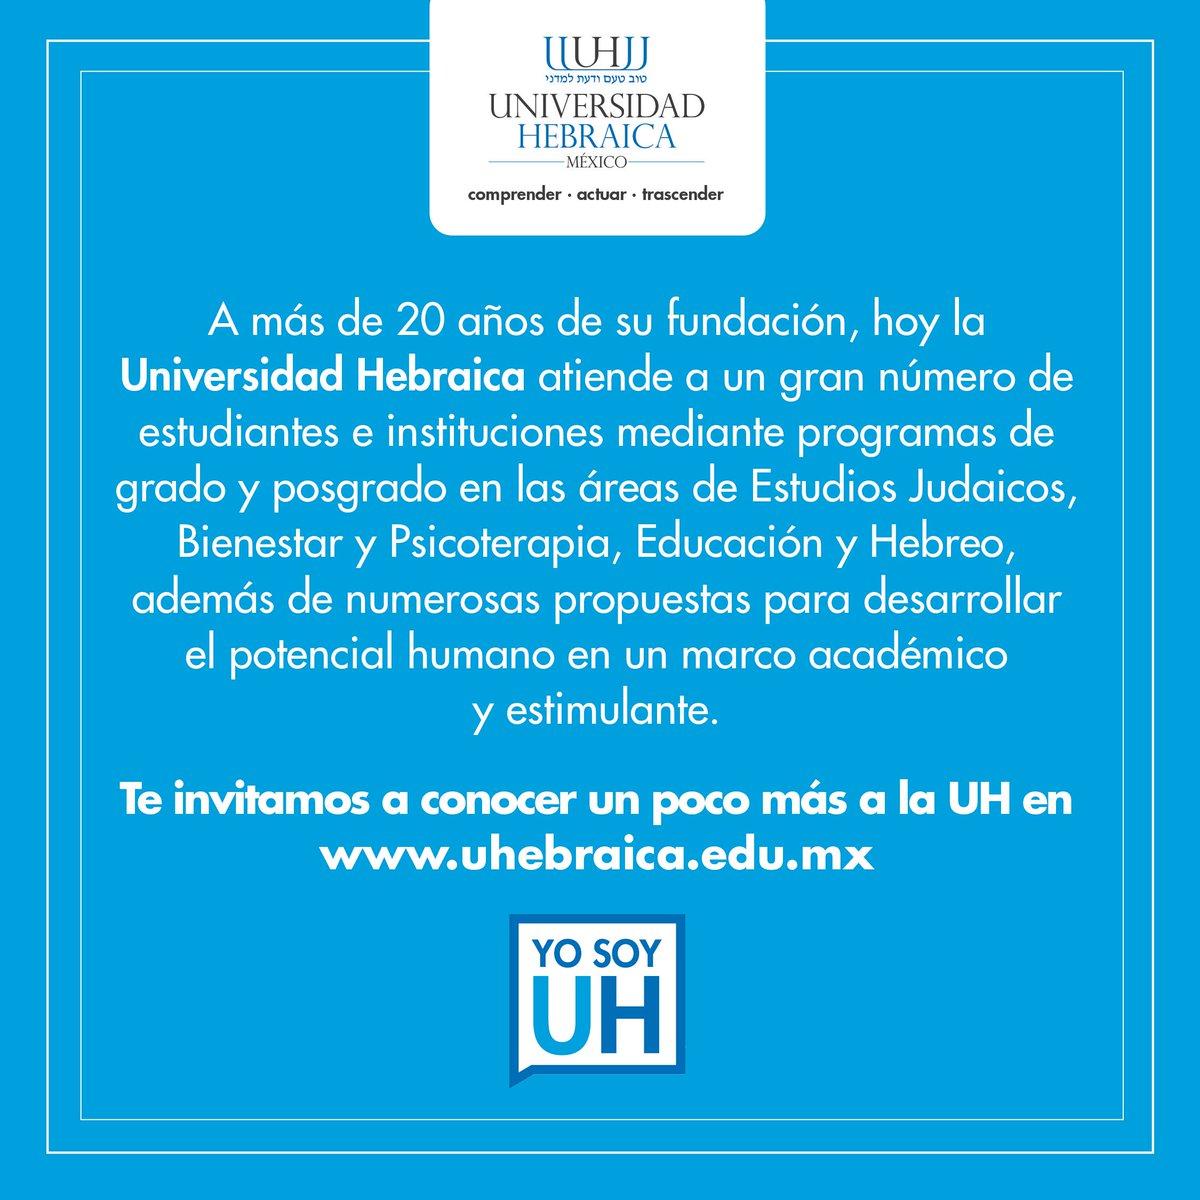 Universidad Hebraica on Twitter: